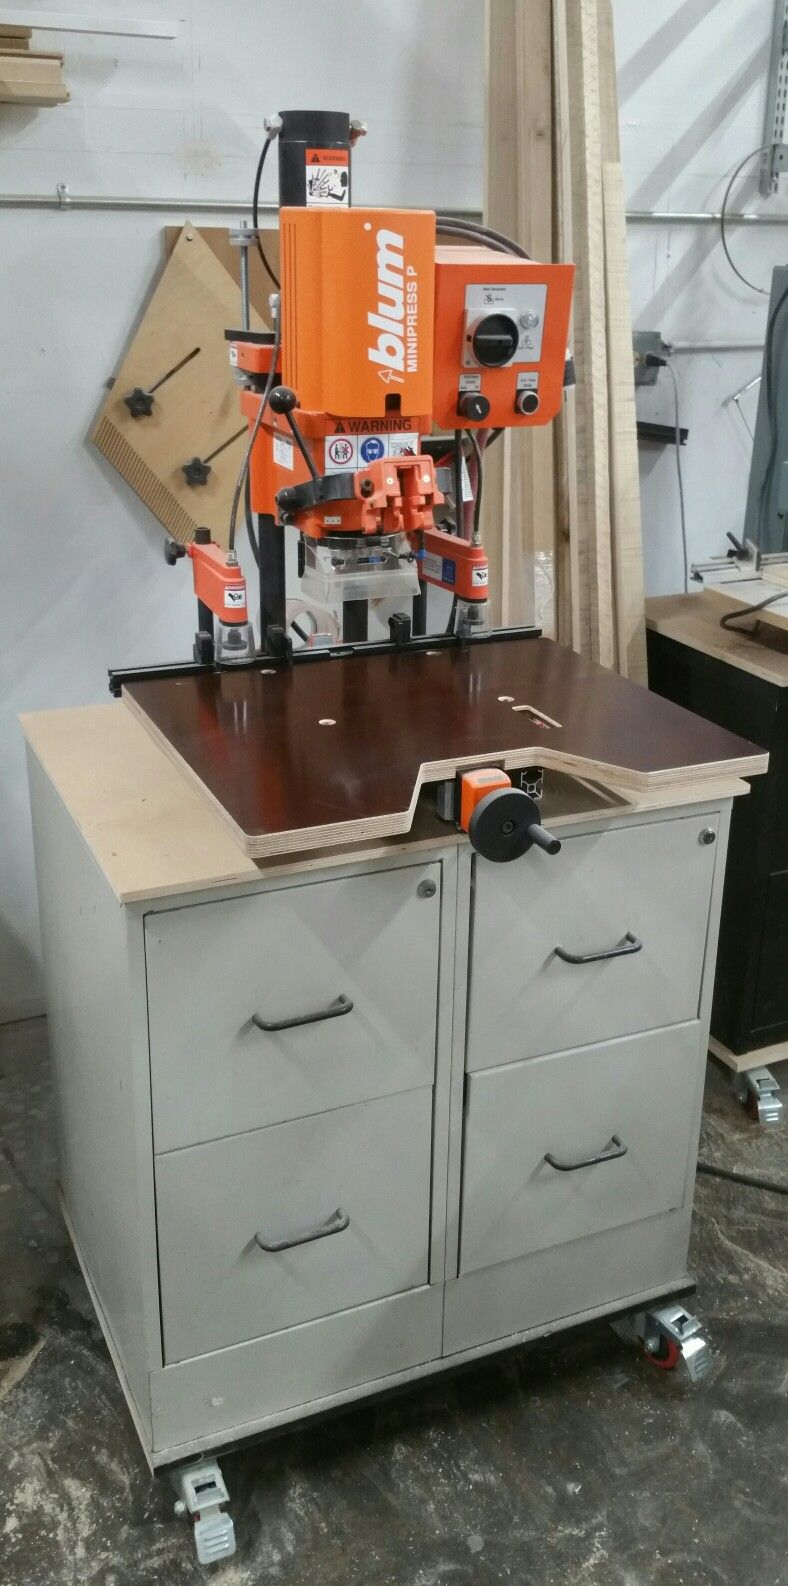 Blum Minipress P Hinge Boring Machine Workbench Decor Kitchen Appliances